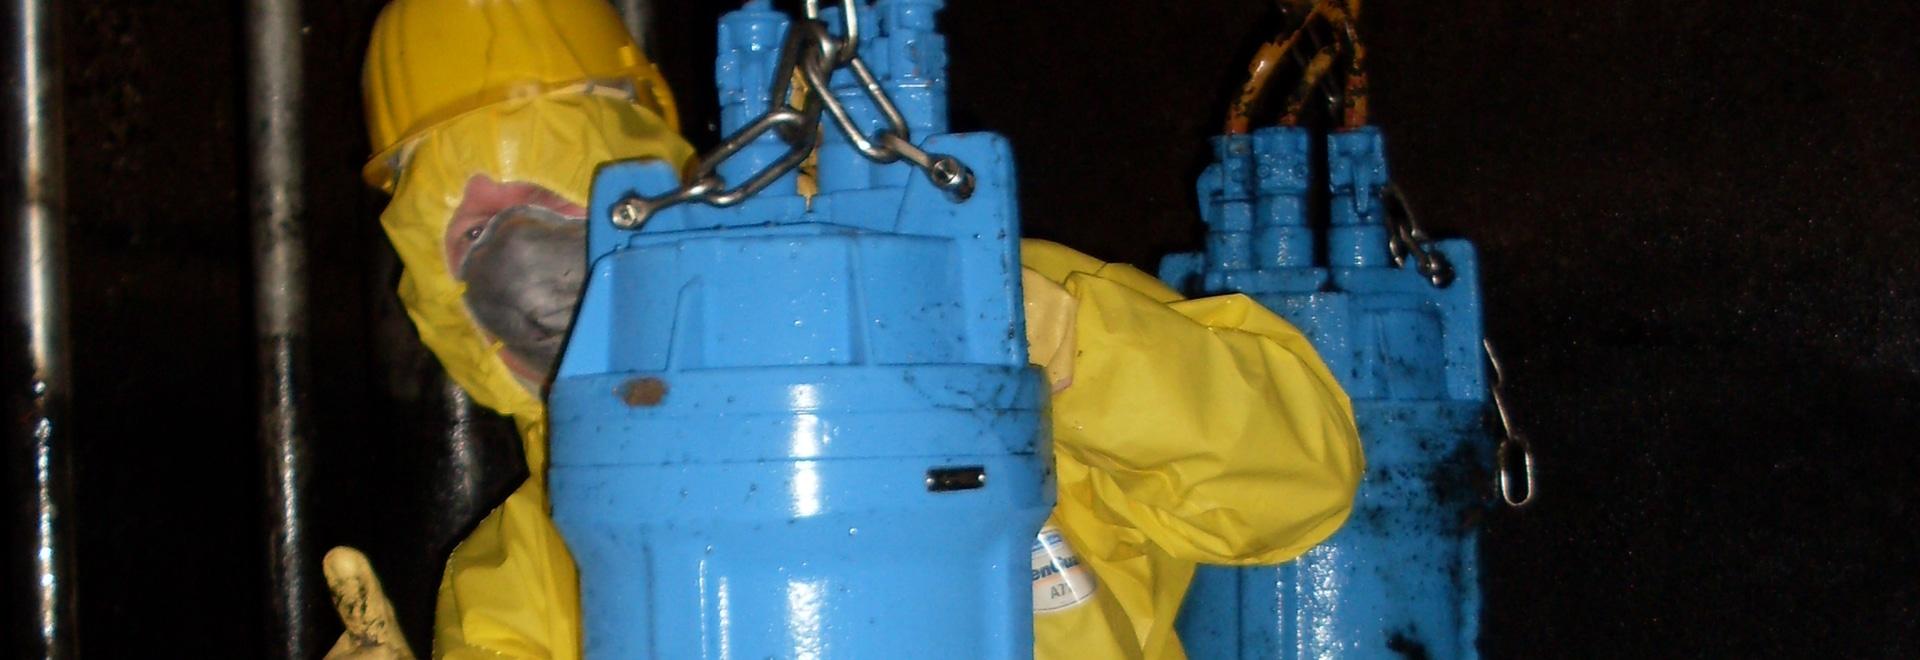 Egger vortex pump in the sump